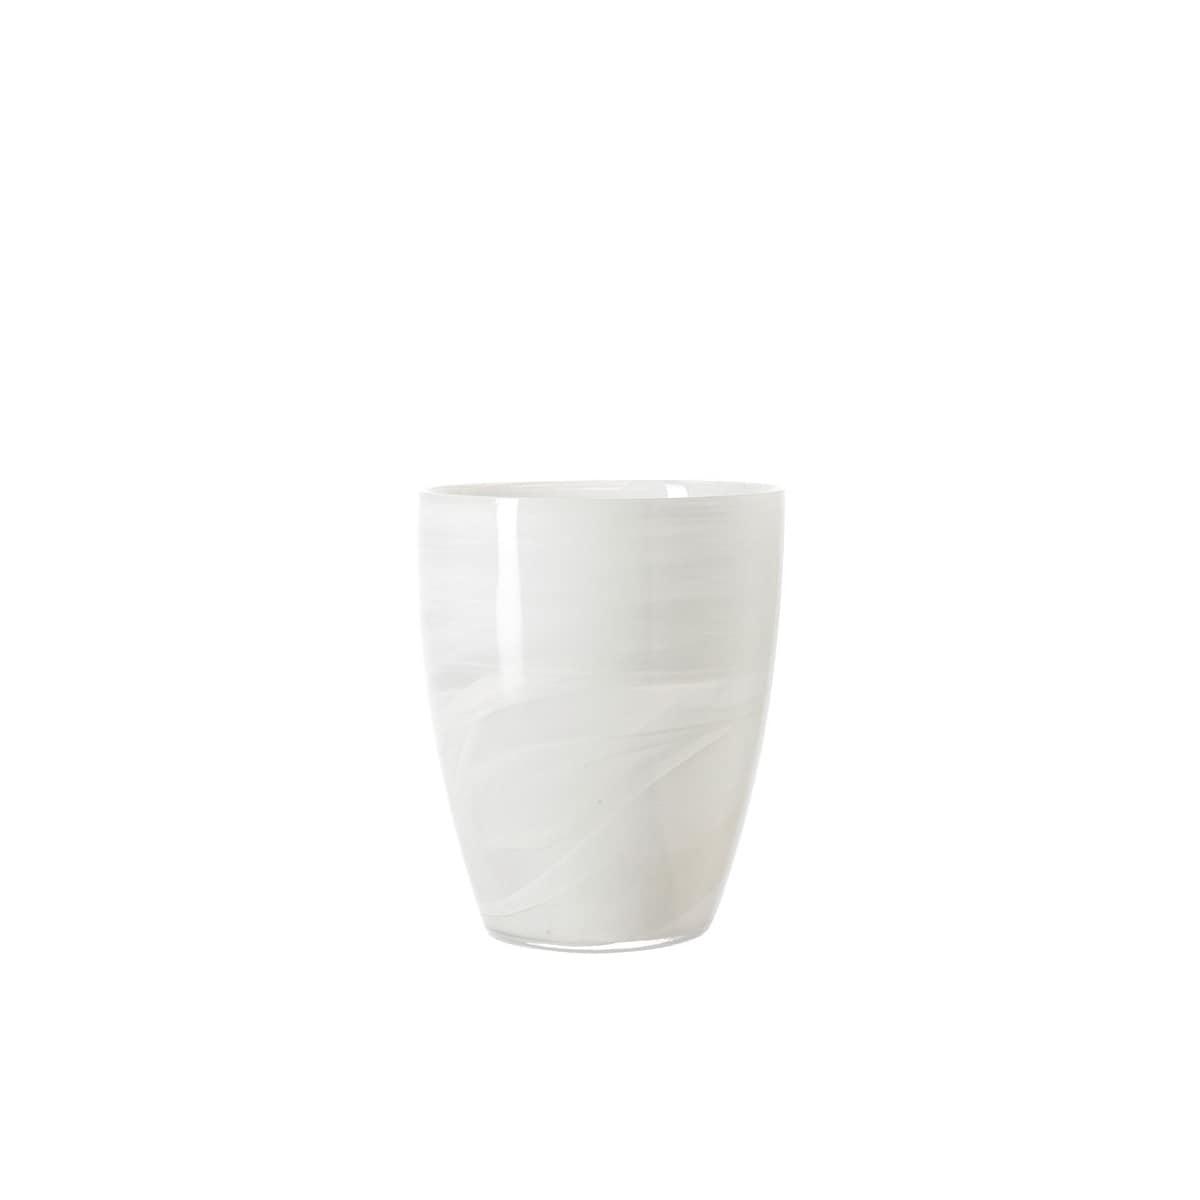 leonardo windlicht vase h 19 alabastro glas alabaster wei porta. Black Bedroom Furniture Sets. Home Design Ideas